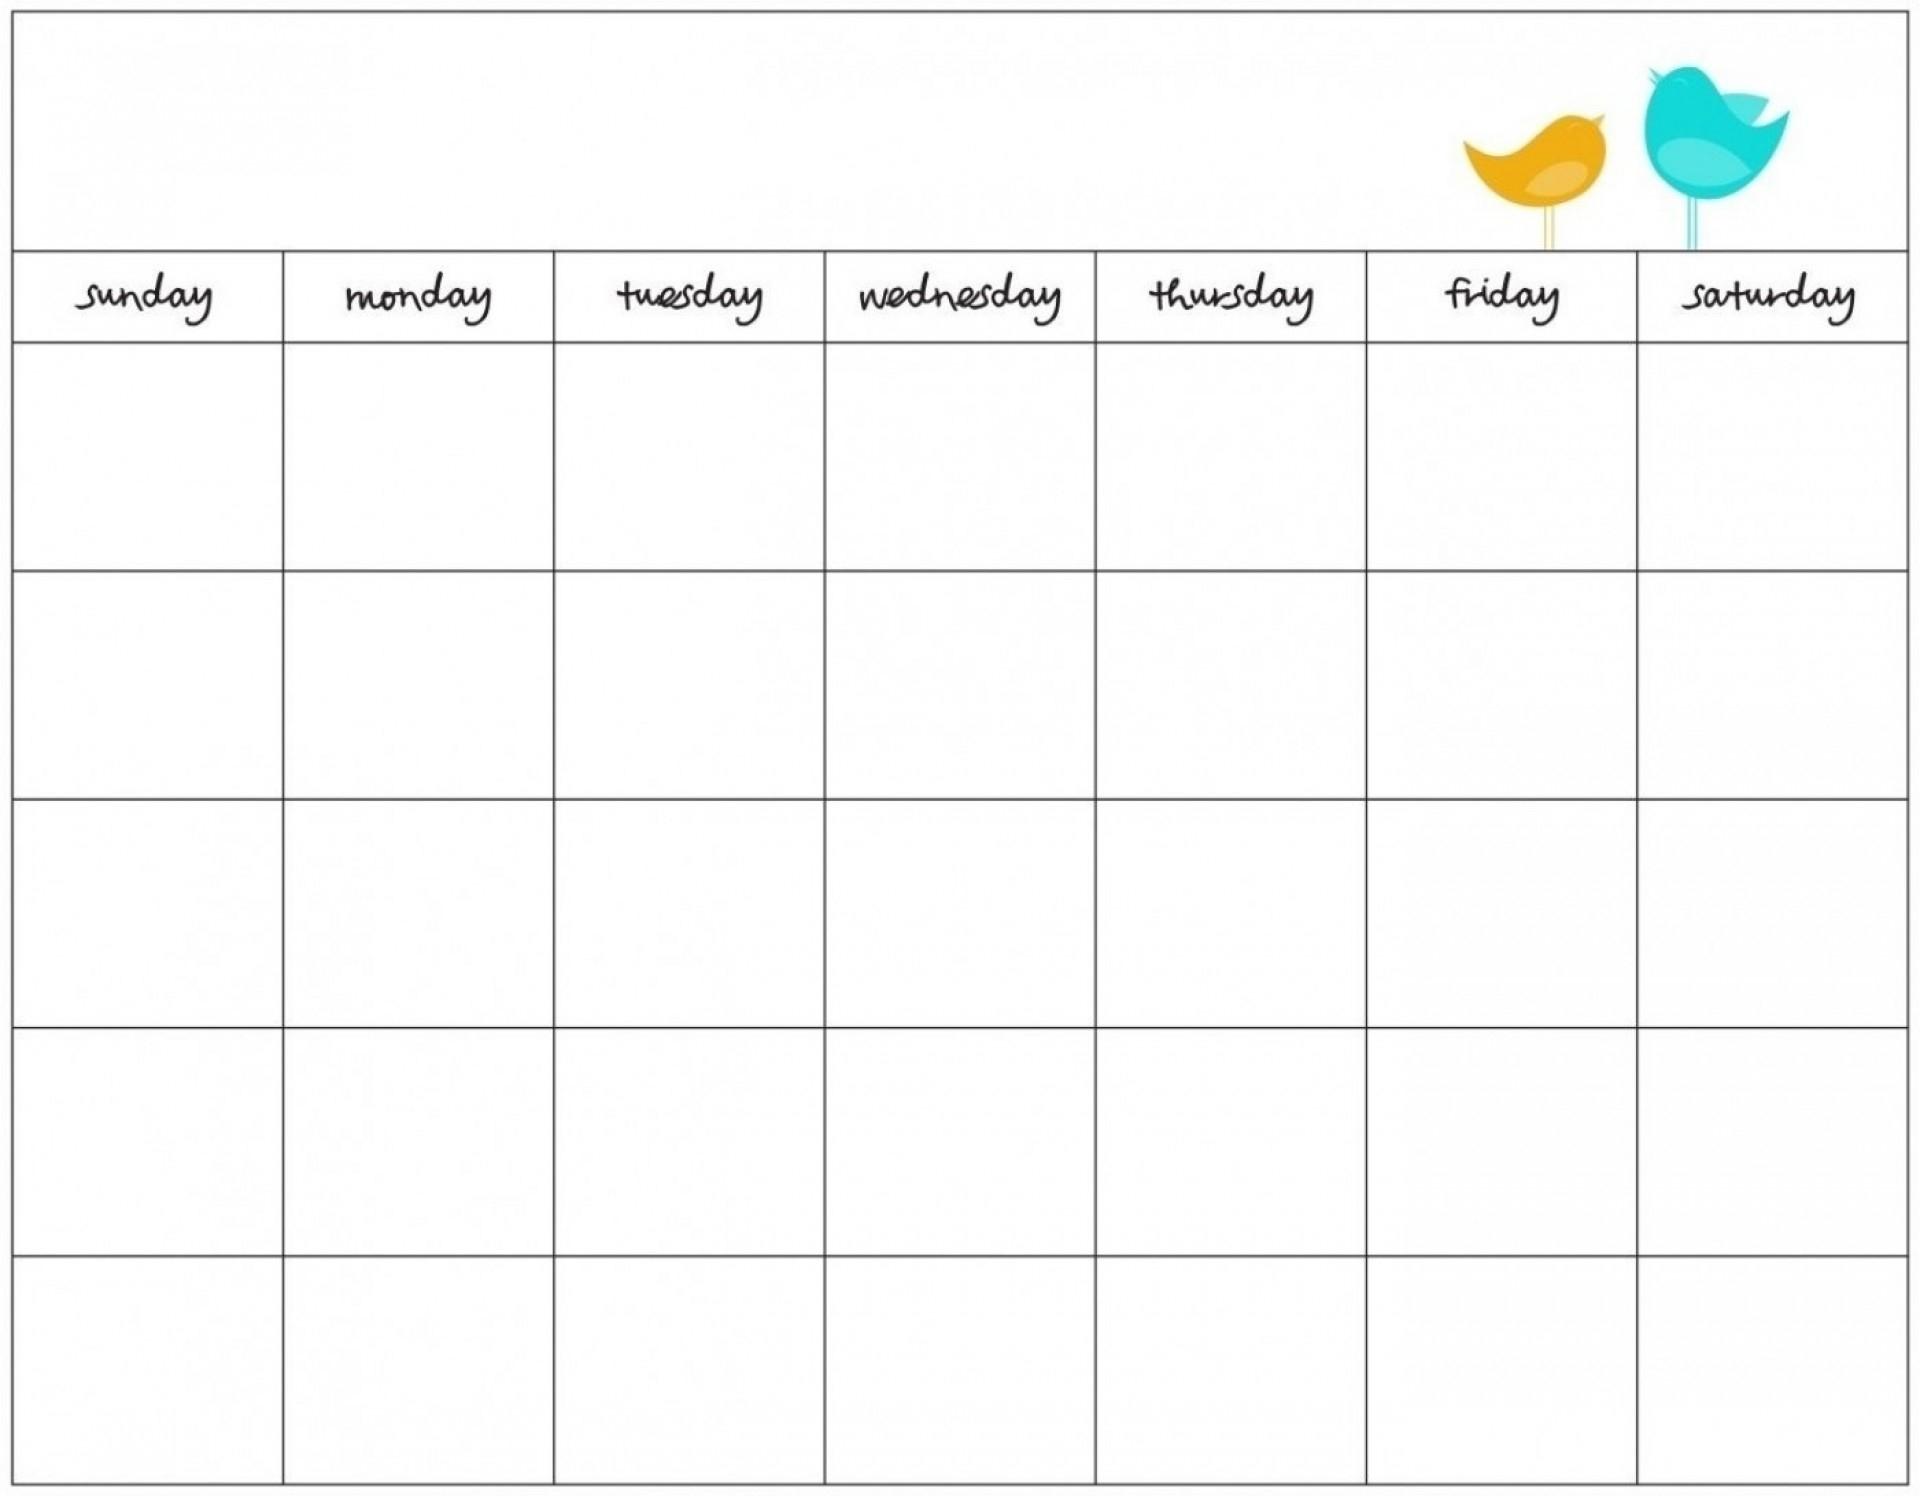 019 Template Ideas Day Stunning 7 Calendar Word Blank inside 7 Day Blank Calendar